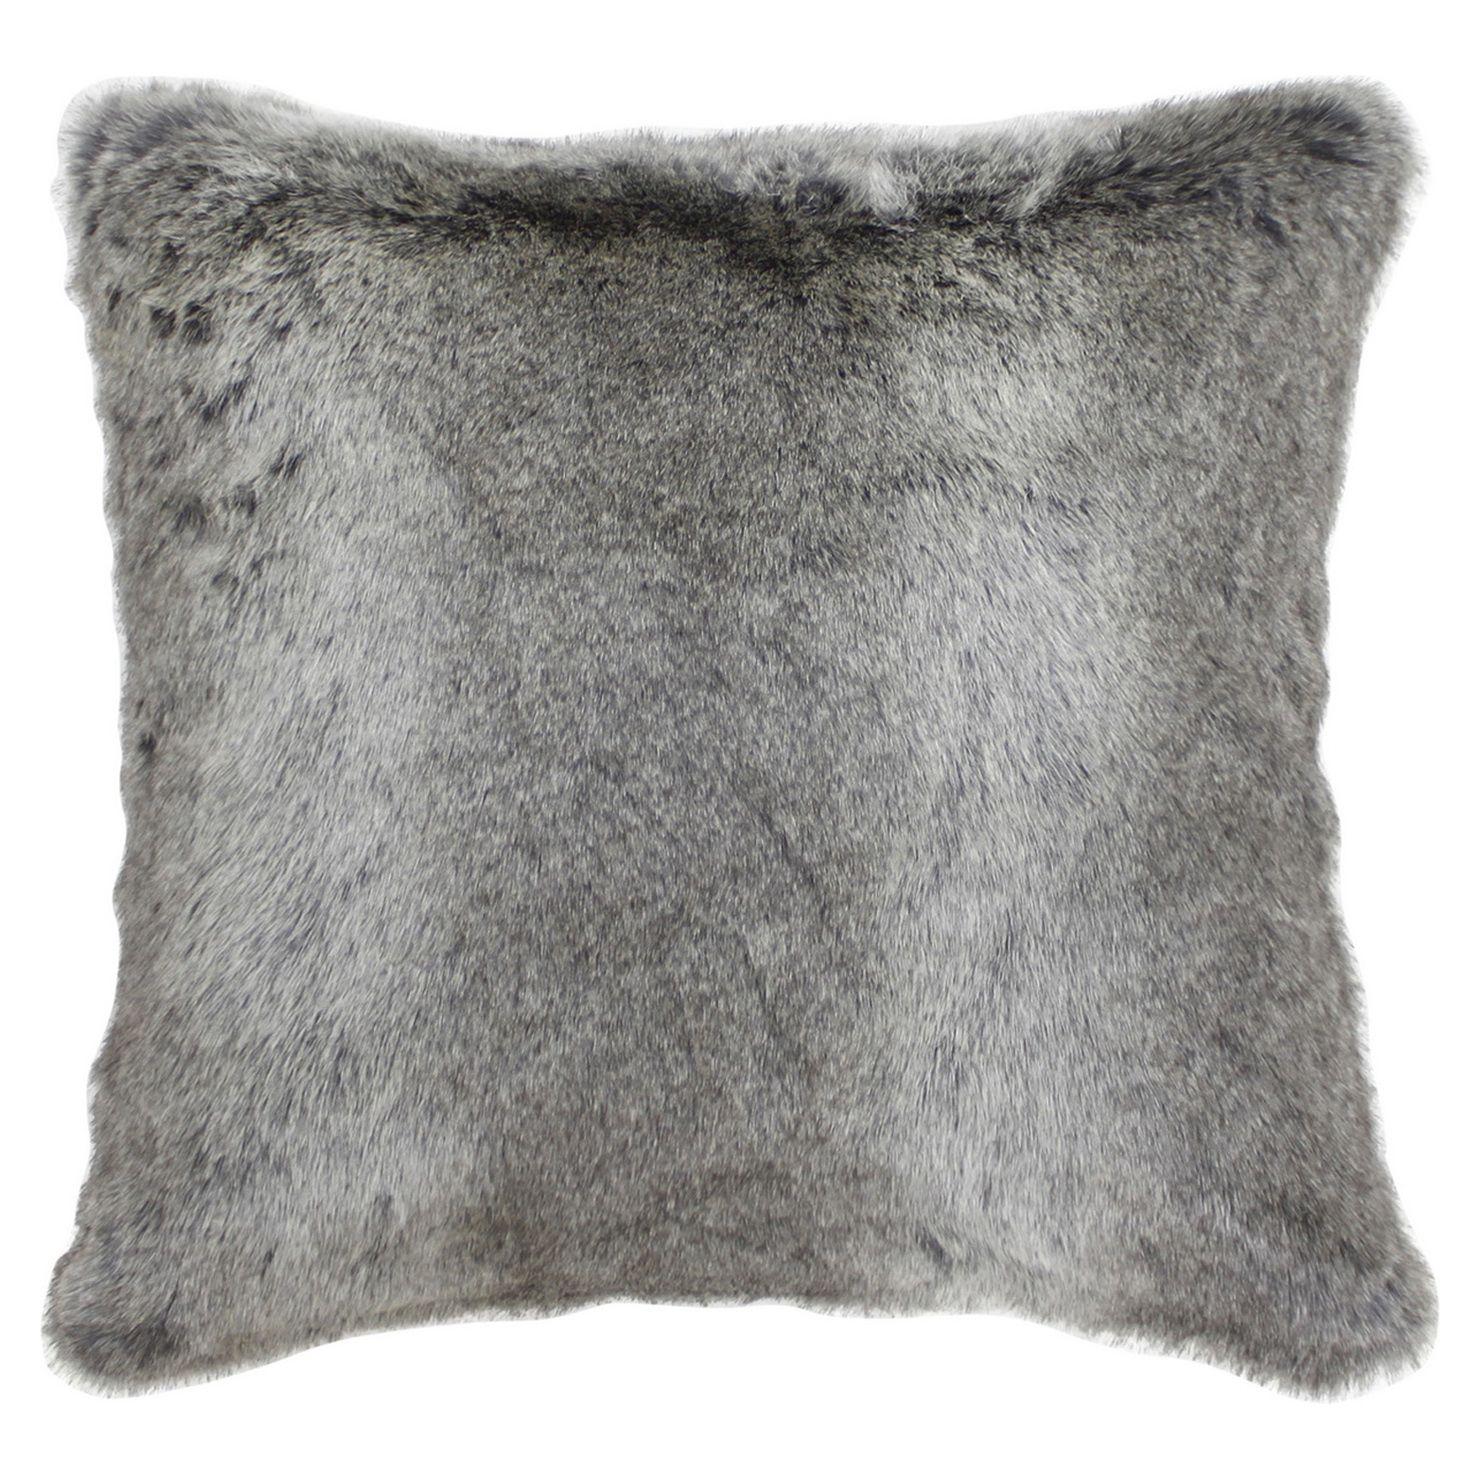 Arctic Wolf Faux Fur Cushion, Grey Grey throw pillows